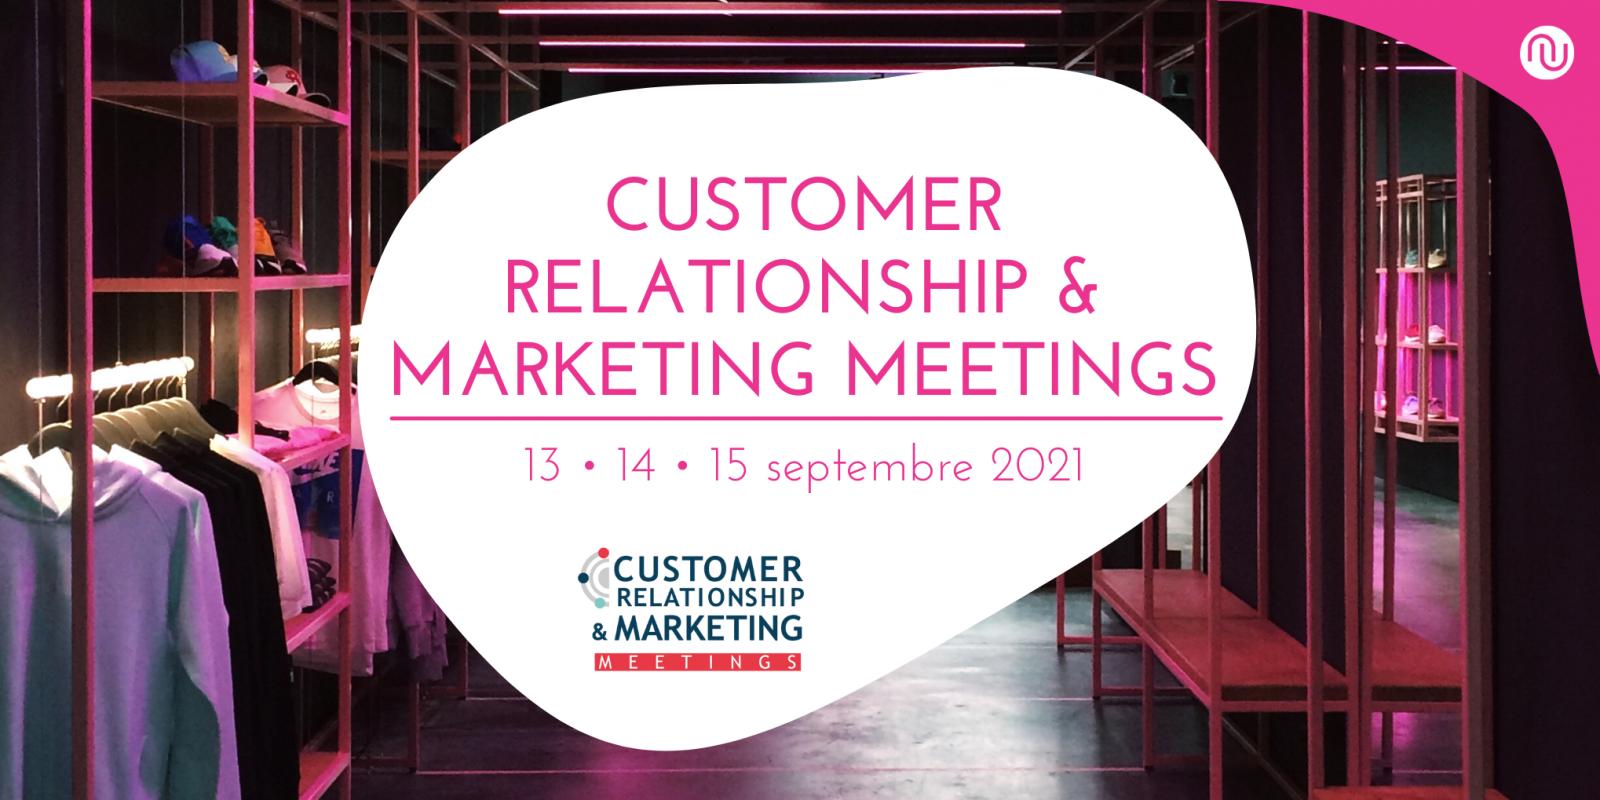 Numen participe au Customer Relationship & Marketing Meetings 2021